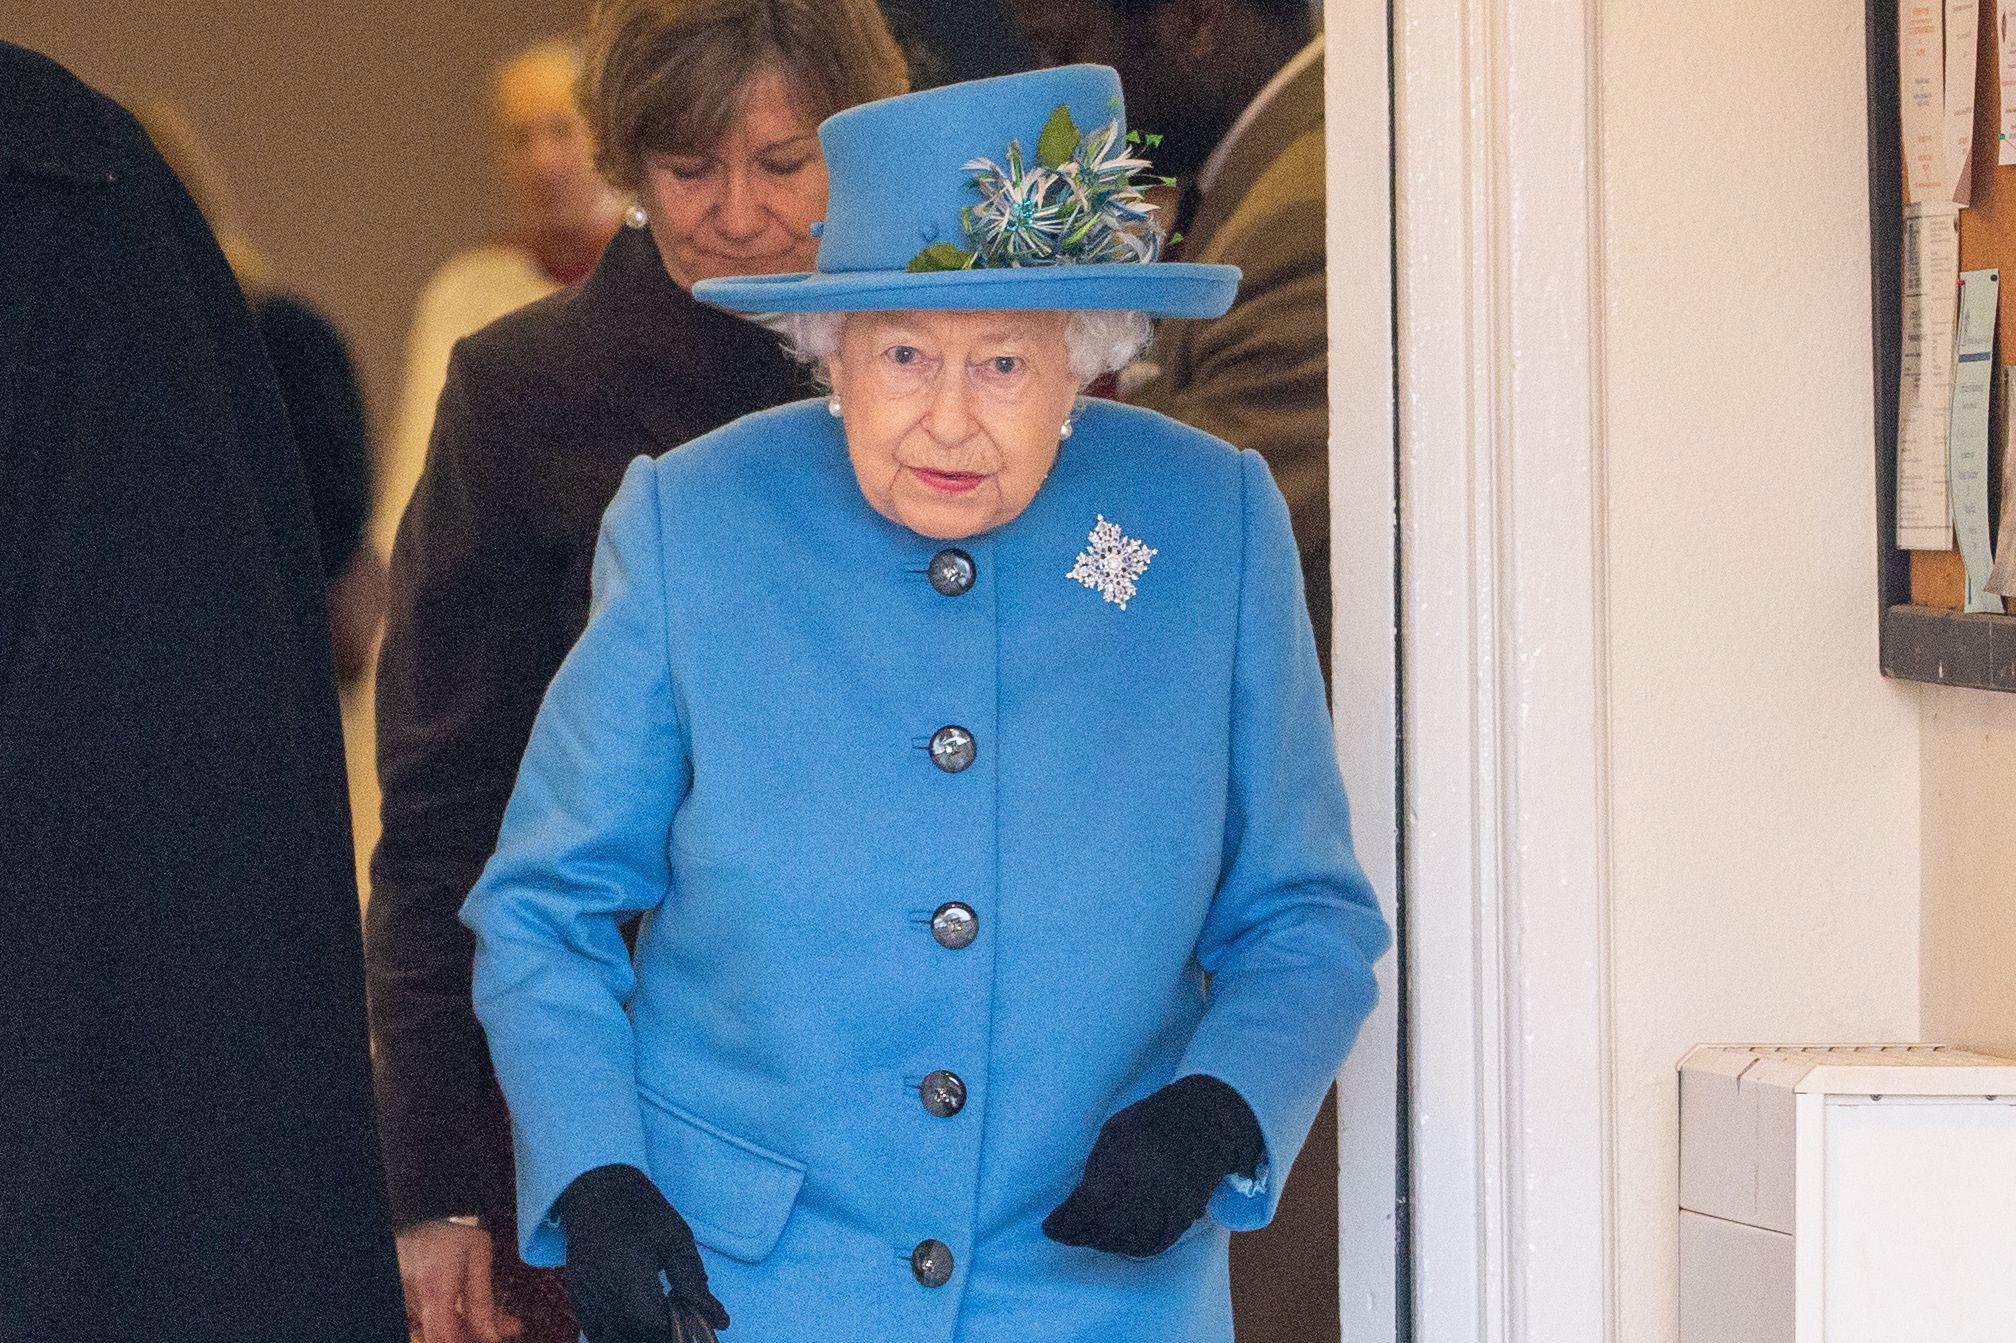 Queen Elizabeth II leaving Queen Elizabeth II visits St Peter and St Paul Parish Church, West Newton, Sandringham, Norfolk, UK - 02 Feb 2020, Image: 496063916, License: Rights-managed, Restrictions: , Model Release: no, Credit line: Geoff Robinson / Shutterstock Editorial / Profimedia